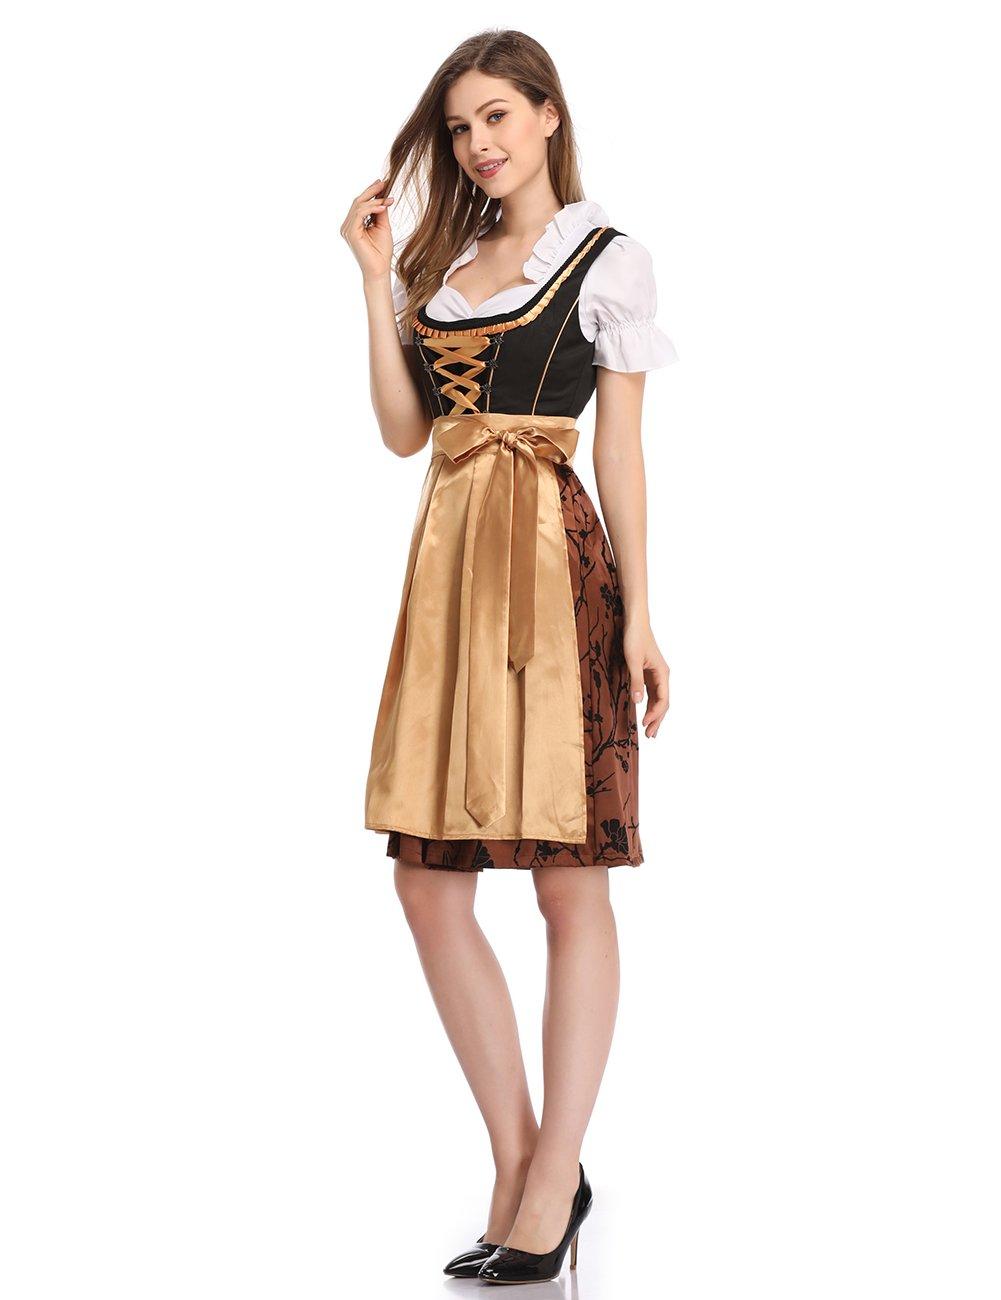 Clearlove Dirndl Dresses Women Brown M